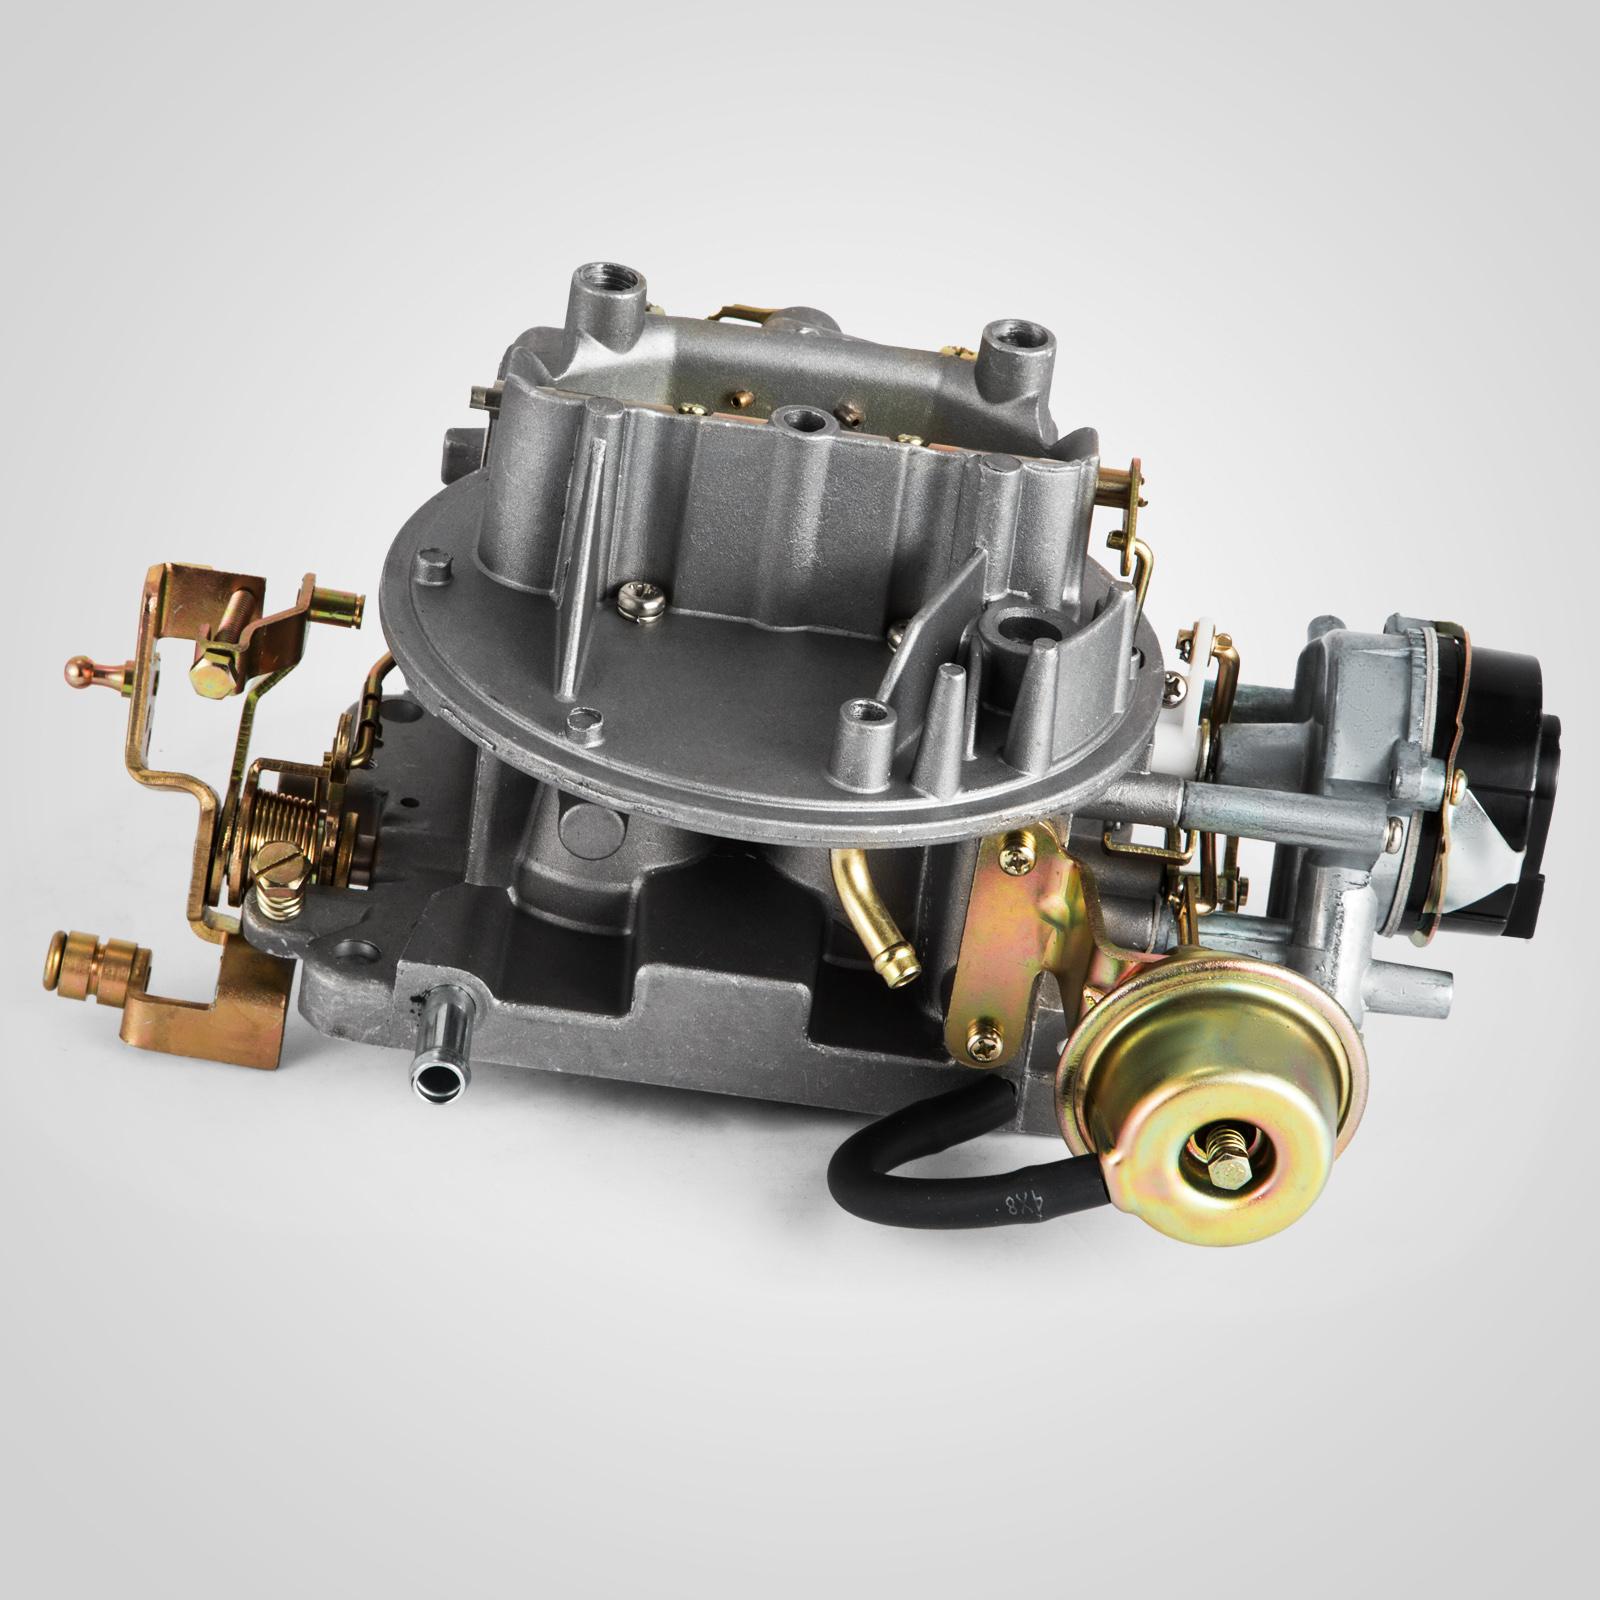 2-Barrel Carburetor Carby 2100 A800 Fit Ford Mustang 289 302 351 Cu Engine 68-73